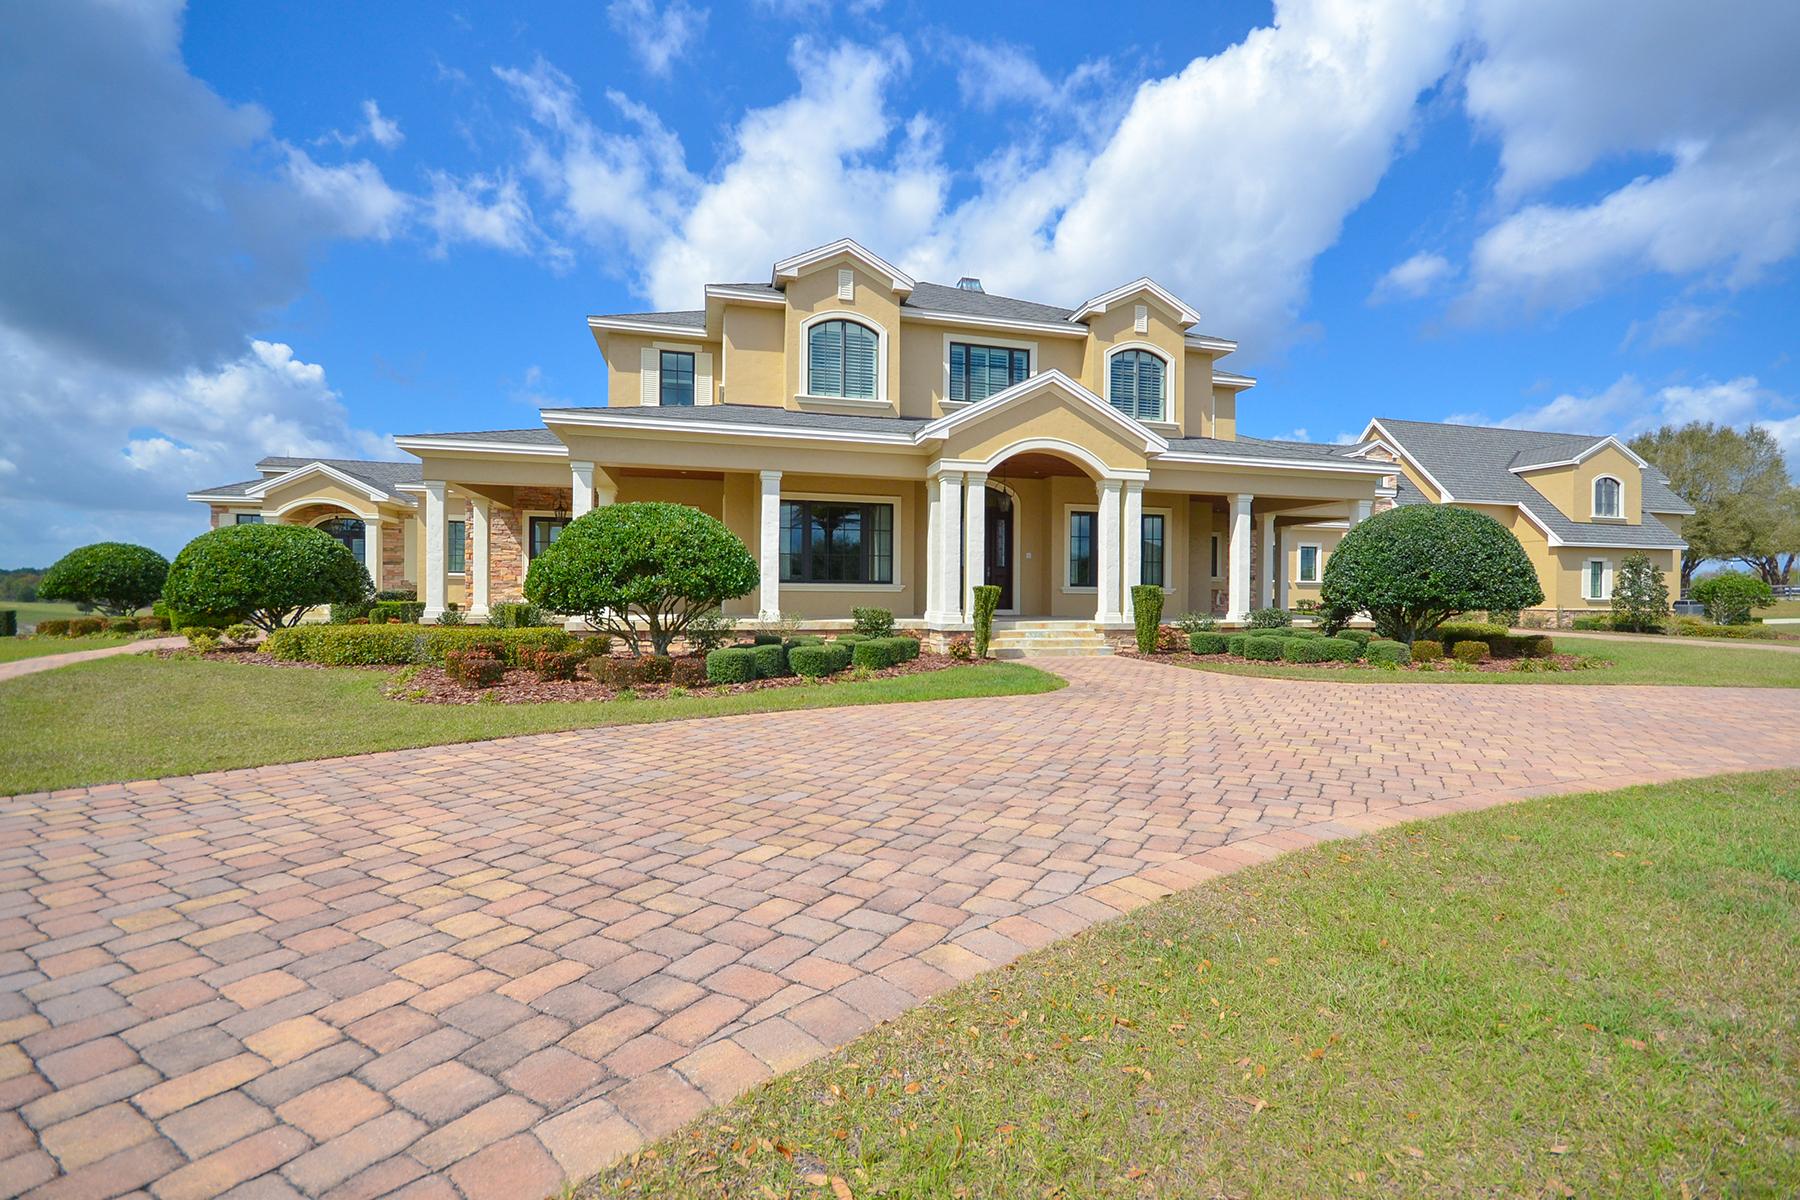 独户住宅 为 销售 在 LADY LAKE 5650 Marion County Rd Lady Lake, 佛罗里达州, 32159 美国